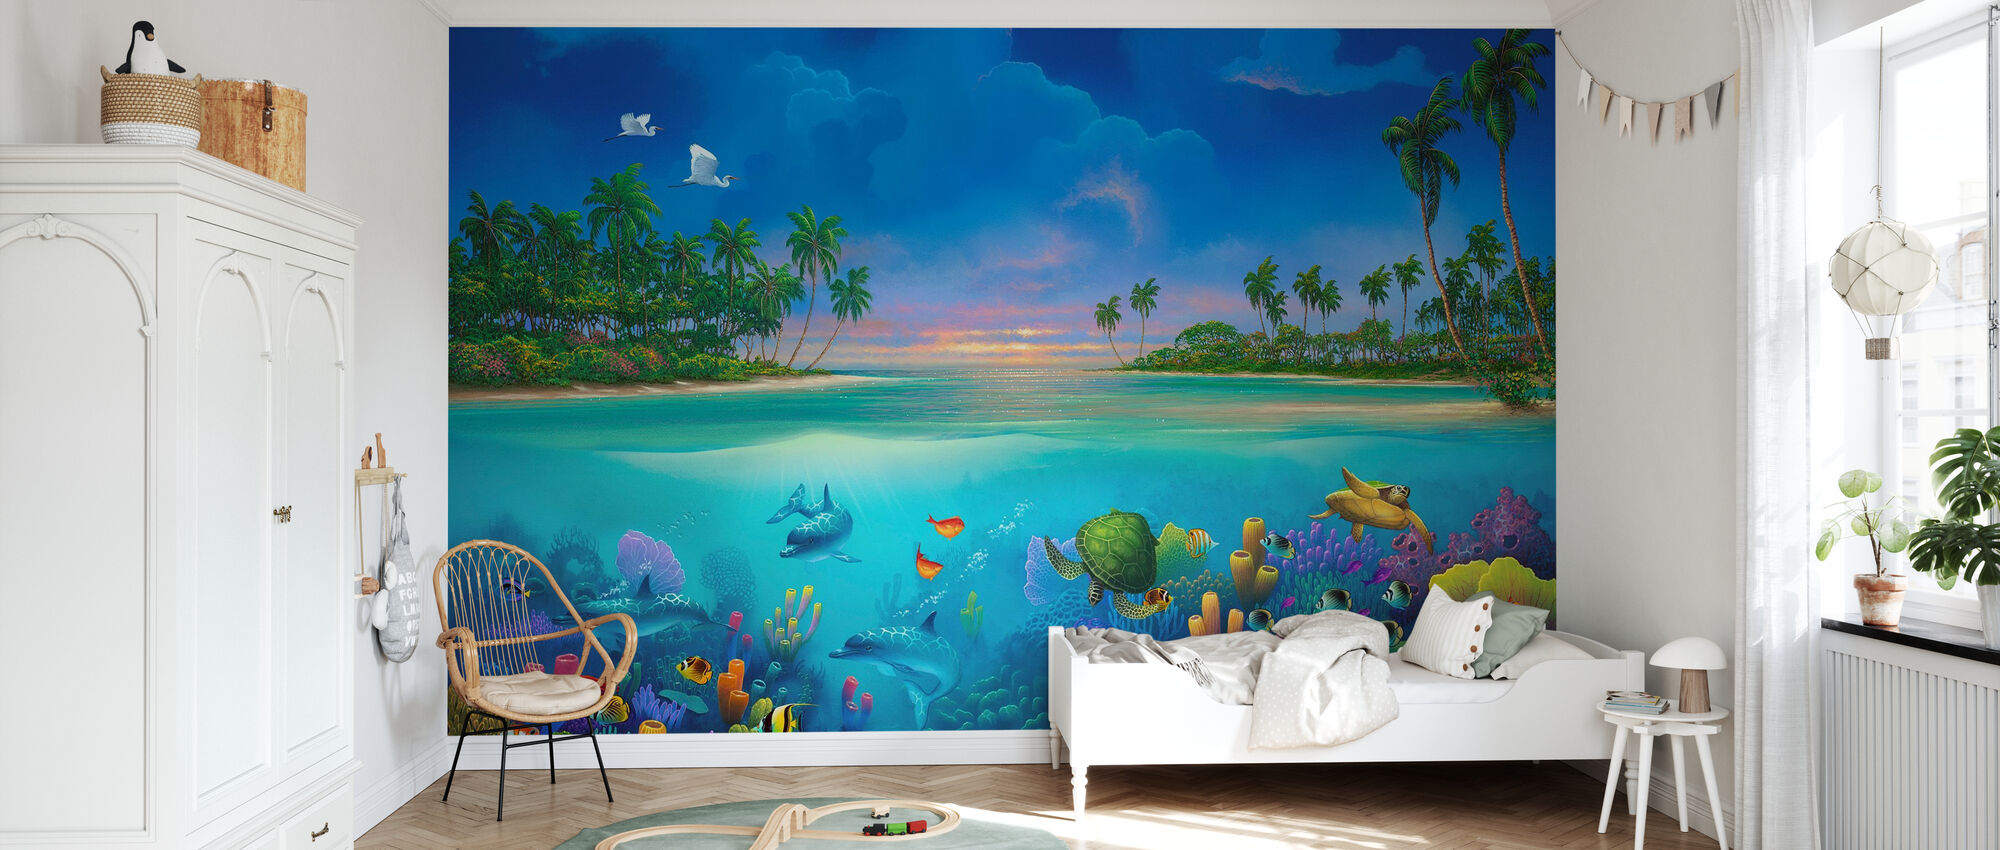 Below Paradise - Wallpaper - Kids Room